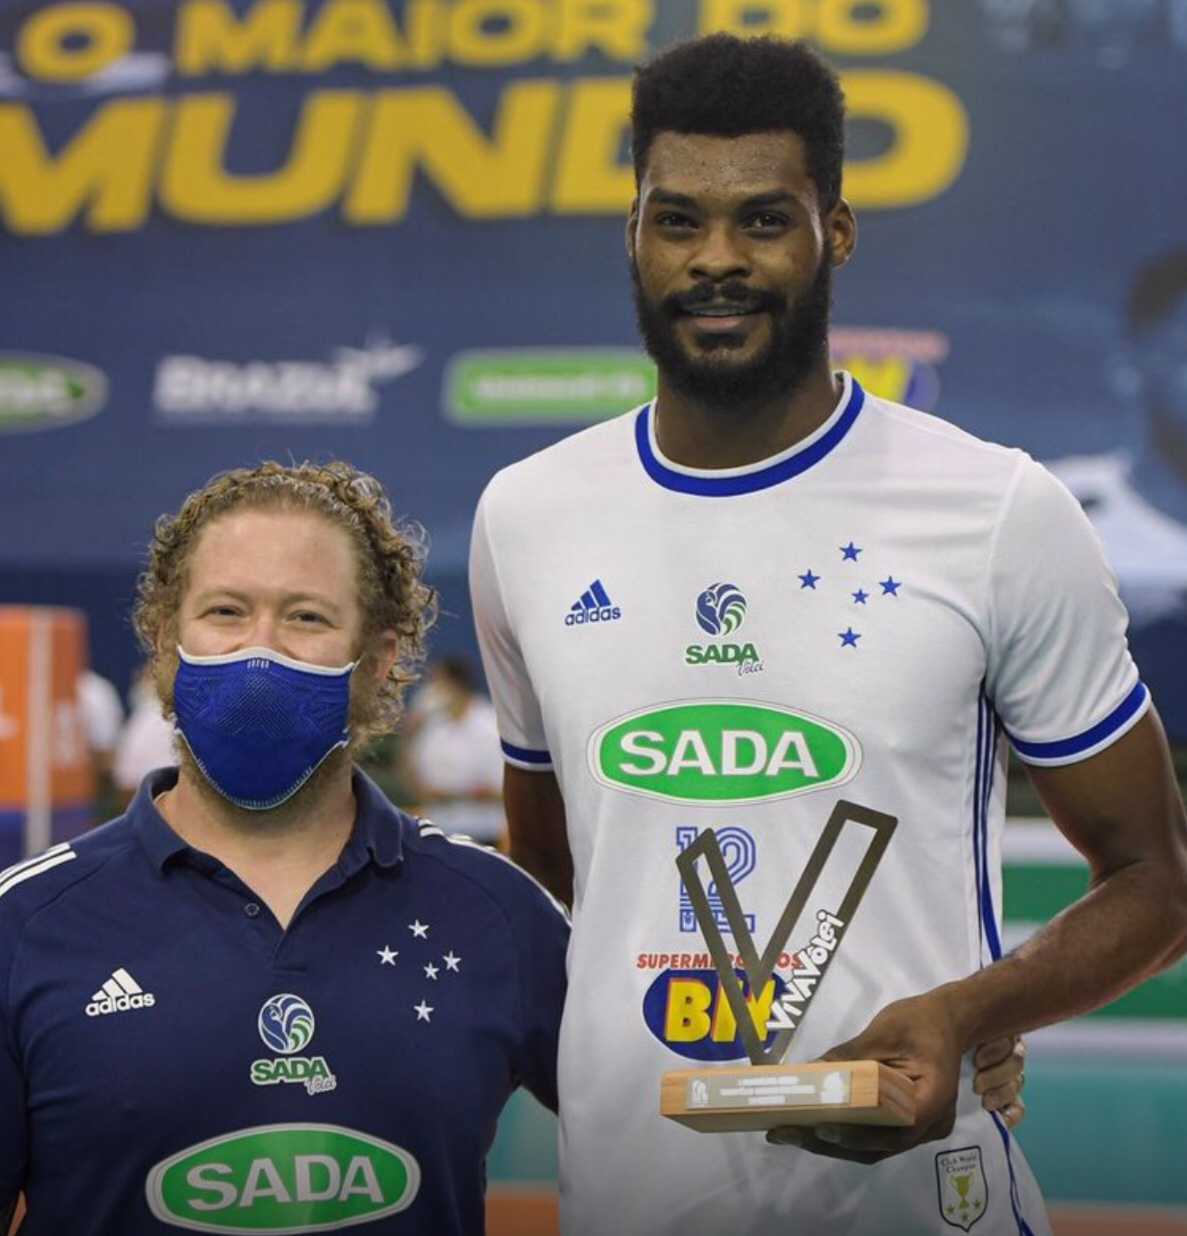 Brazil: Sada Cruzeiro wins regular season. Relegation for Ribeirao